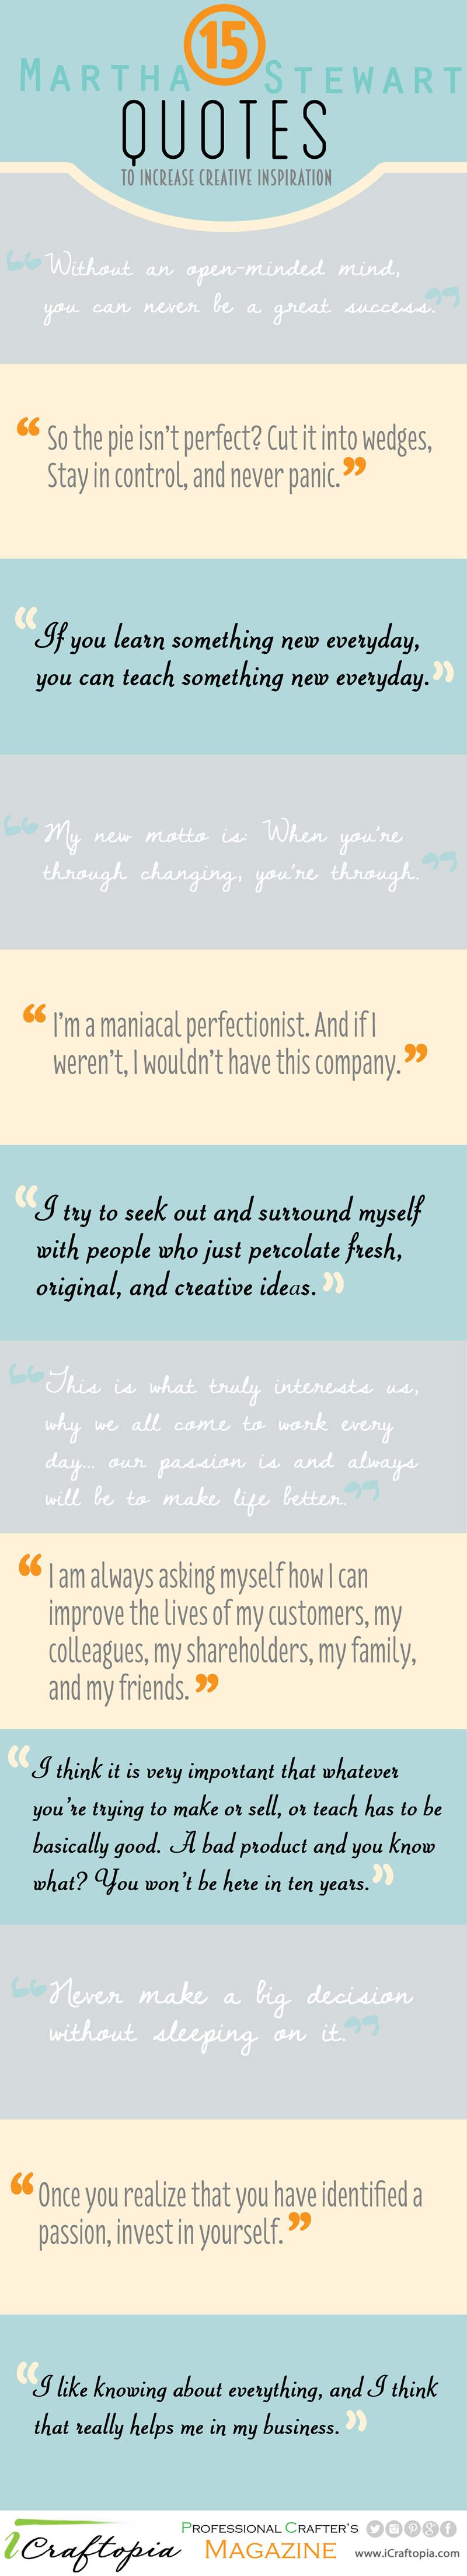 Martha-Stewart-Quotes-Infographic